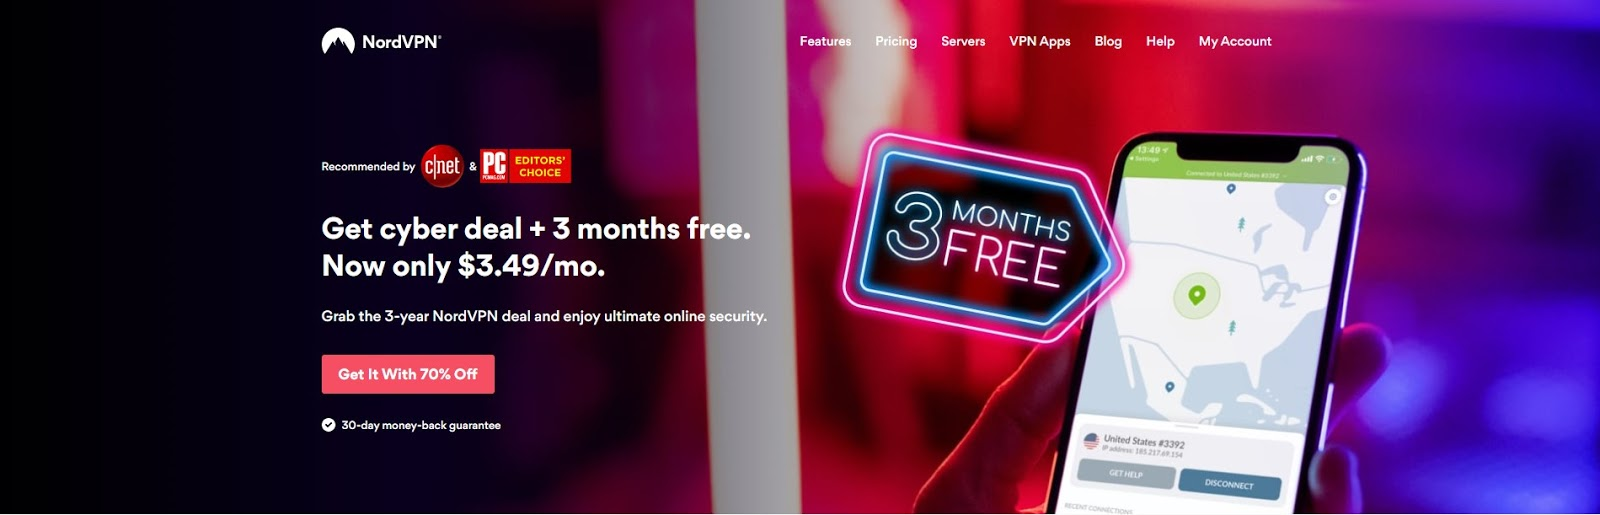 nordvpn black friday cyber monday discount